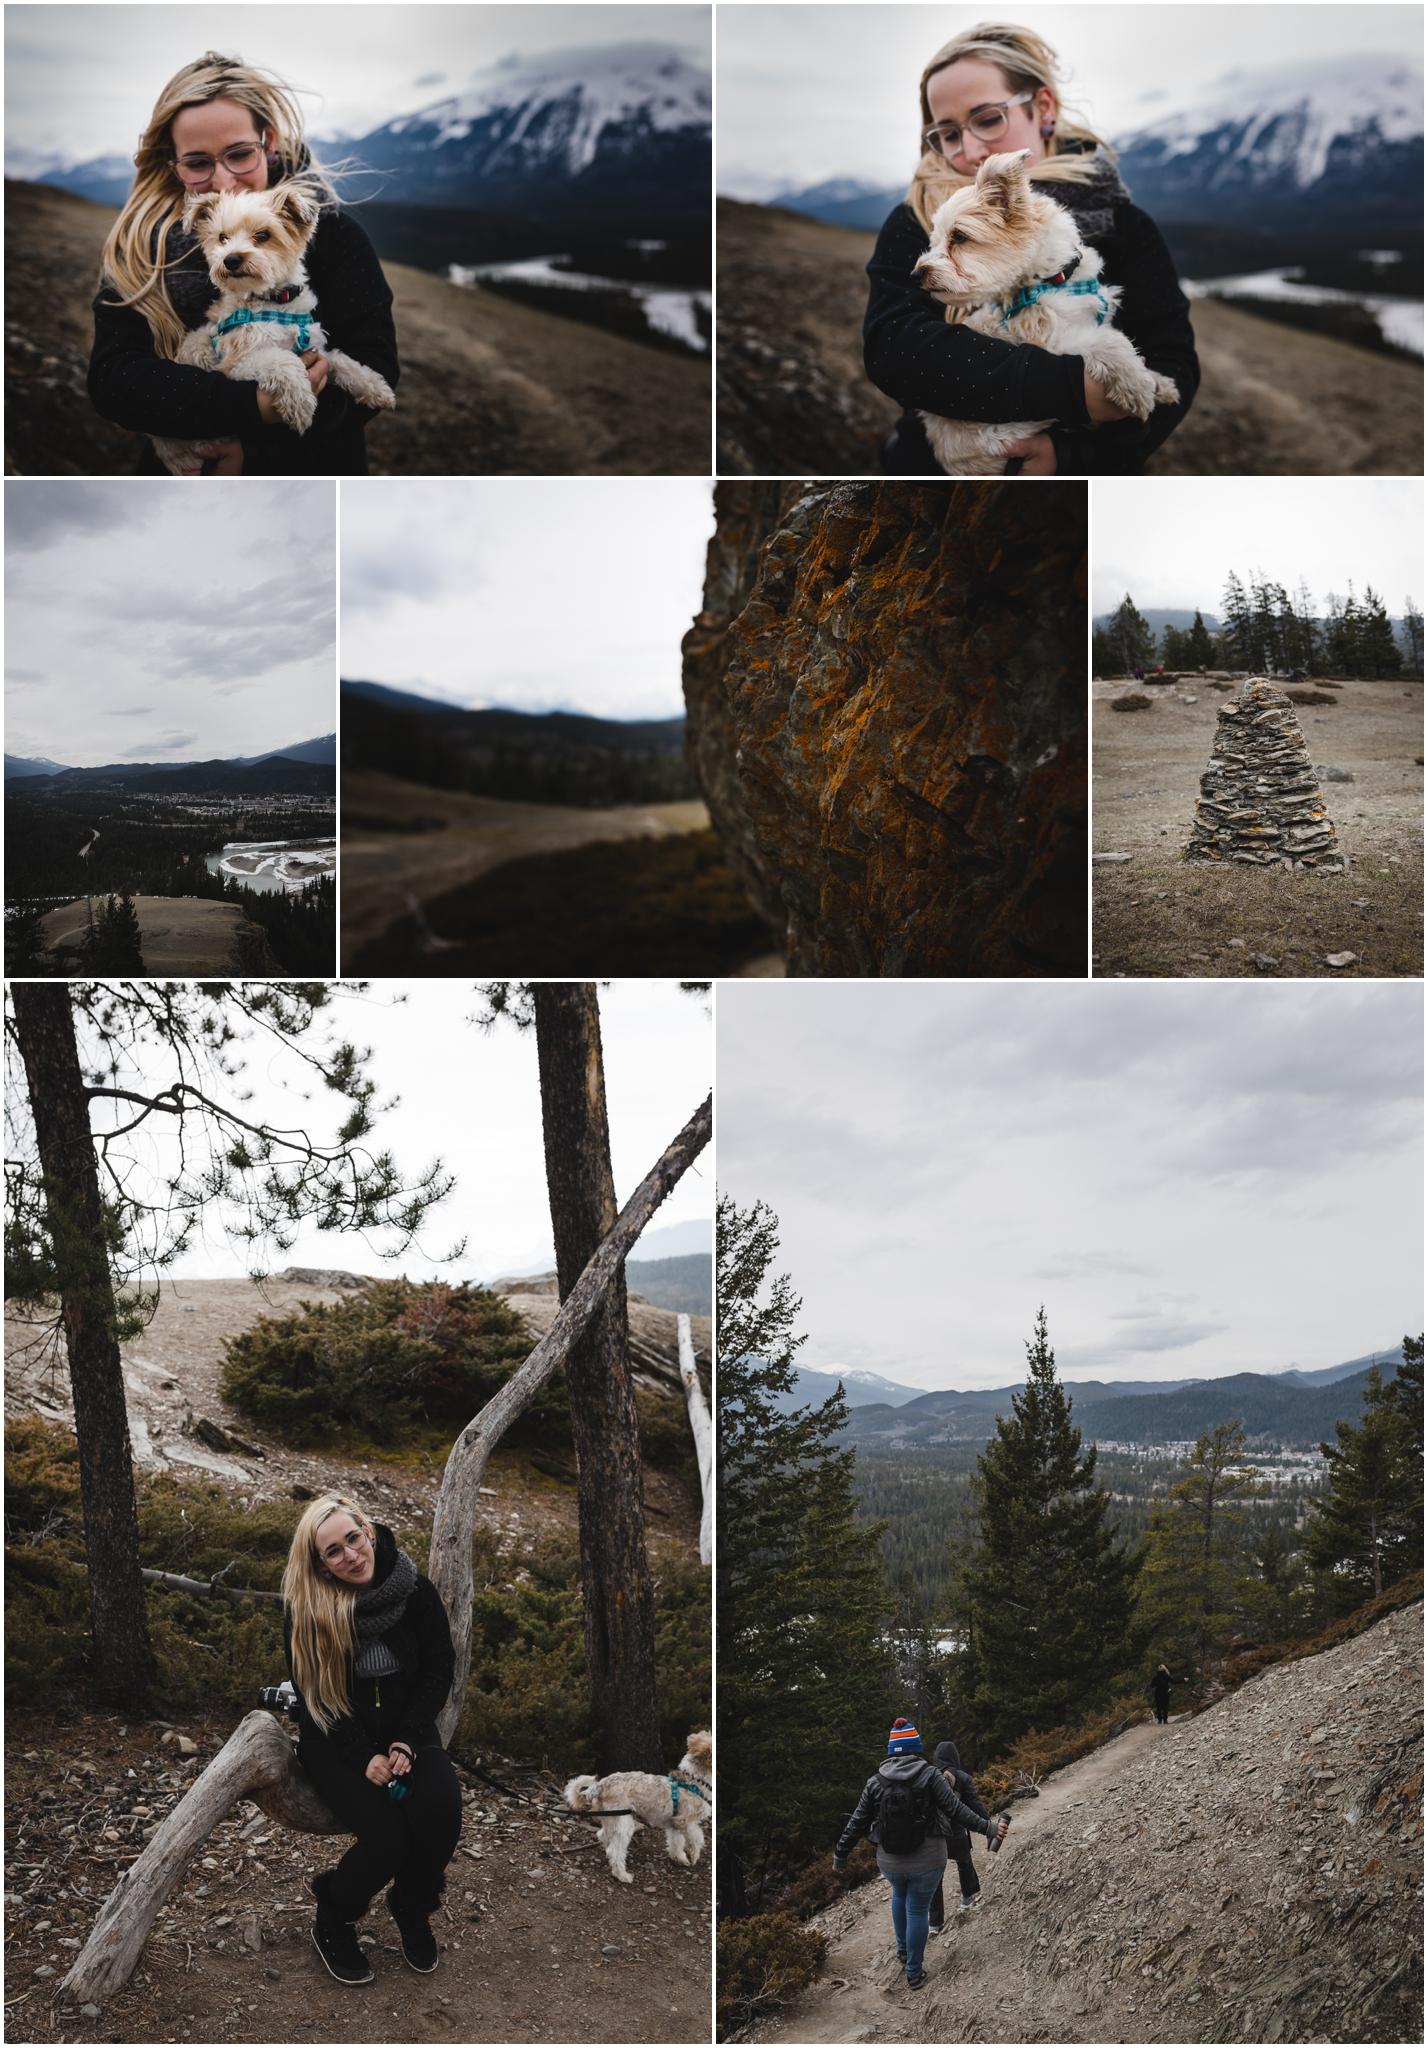 Jasper National Park Alberta Canada - Old Fort Point - Athabasca River - Jasper Townsite - Treelines Photography - Edmonton Lifestyle Photographer